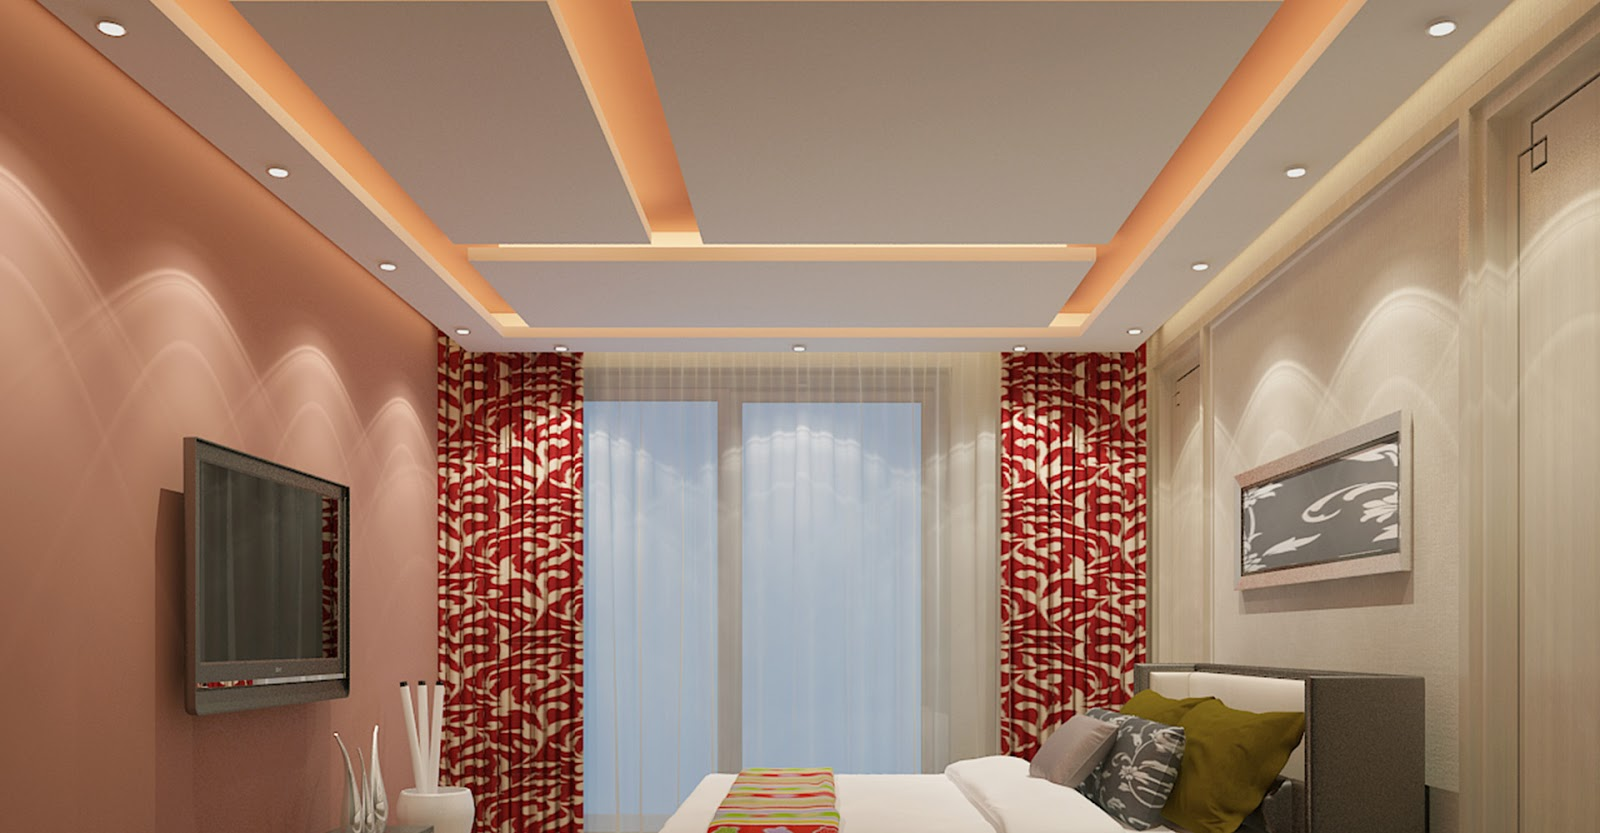 41 Model Plafon Gypsum Rumah Minimalis Yang Elegan Terbaru